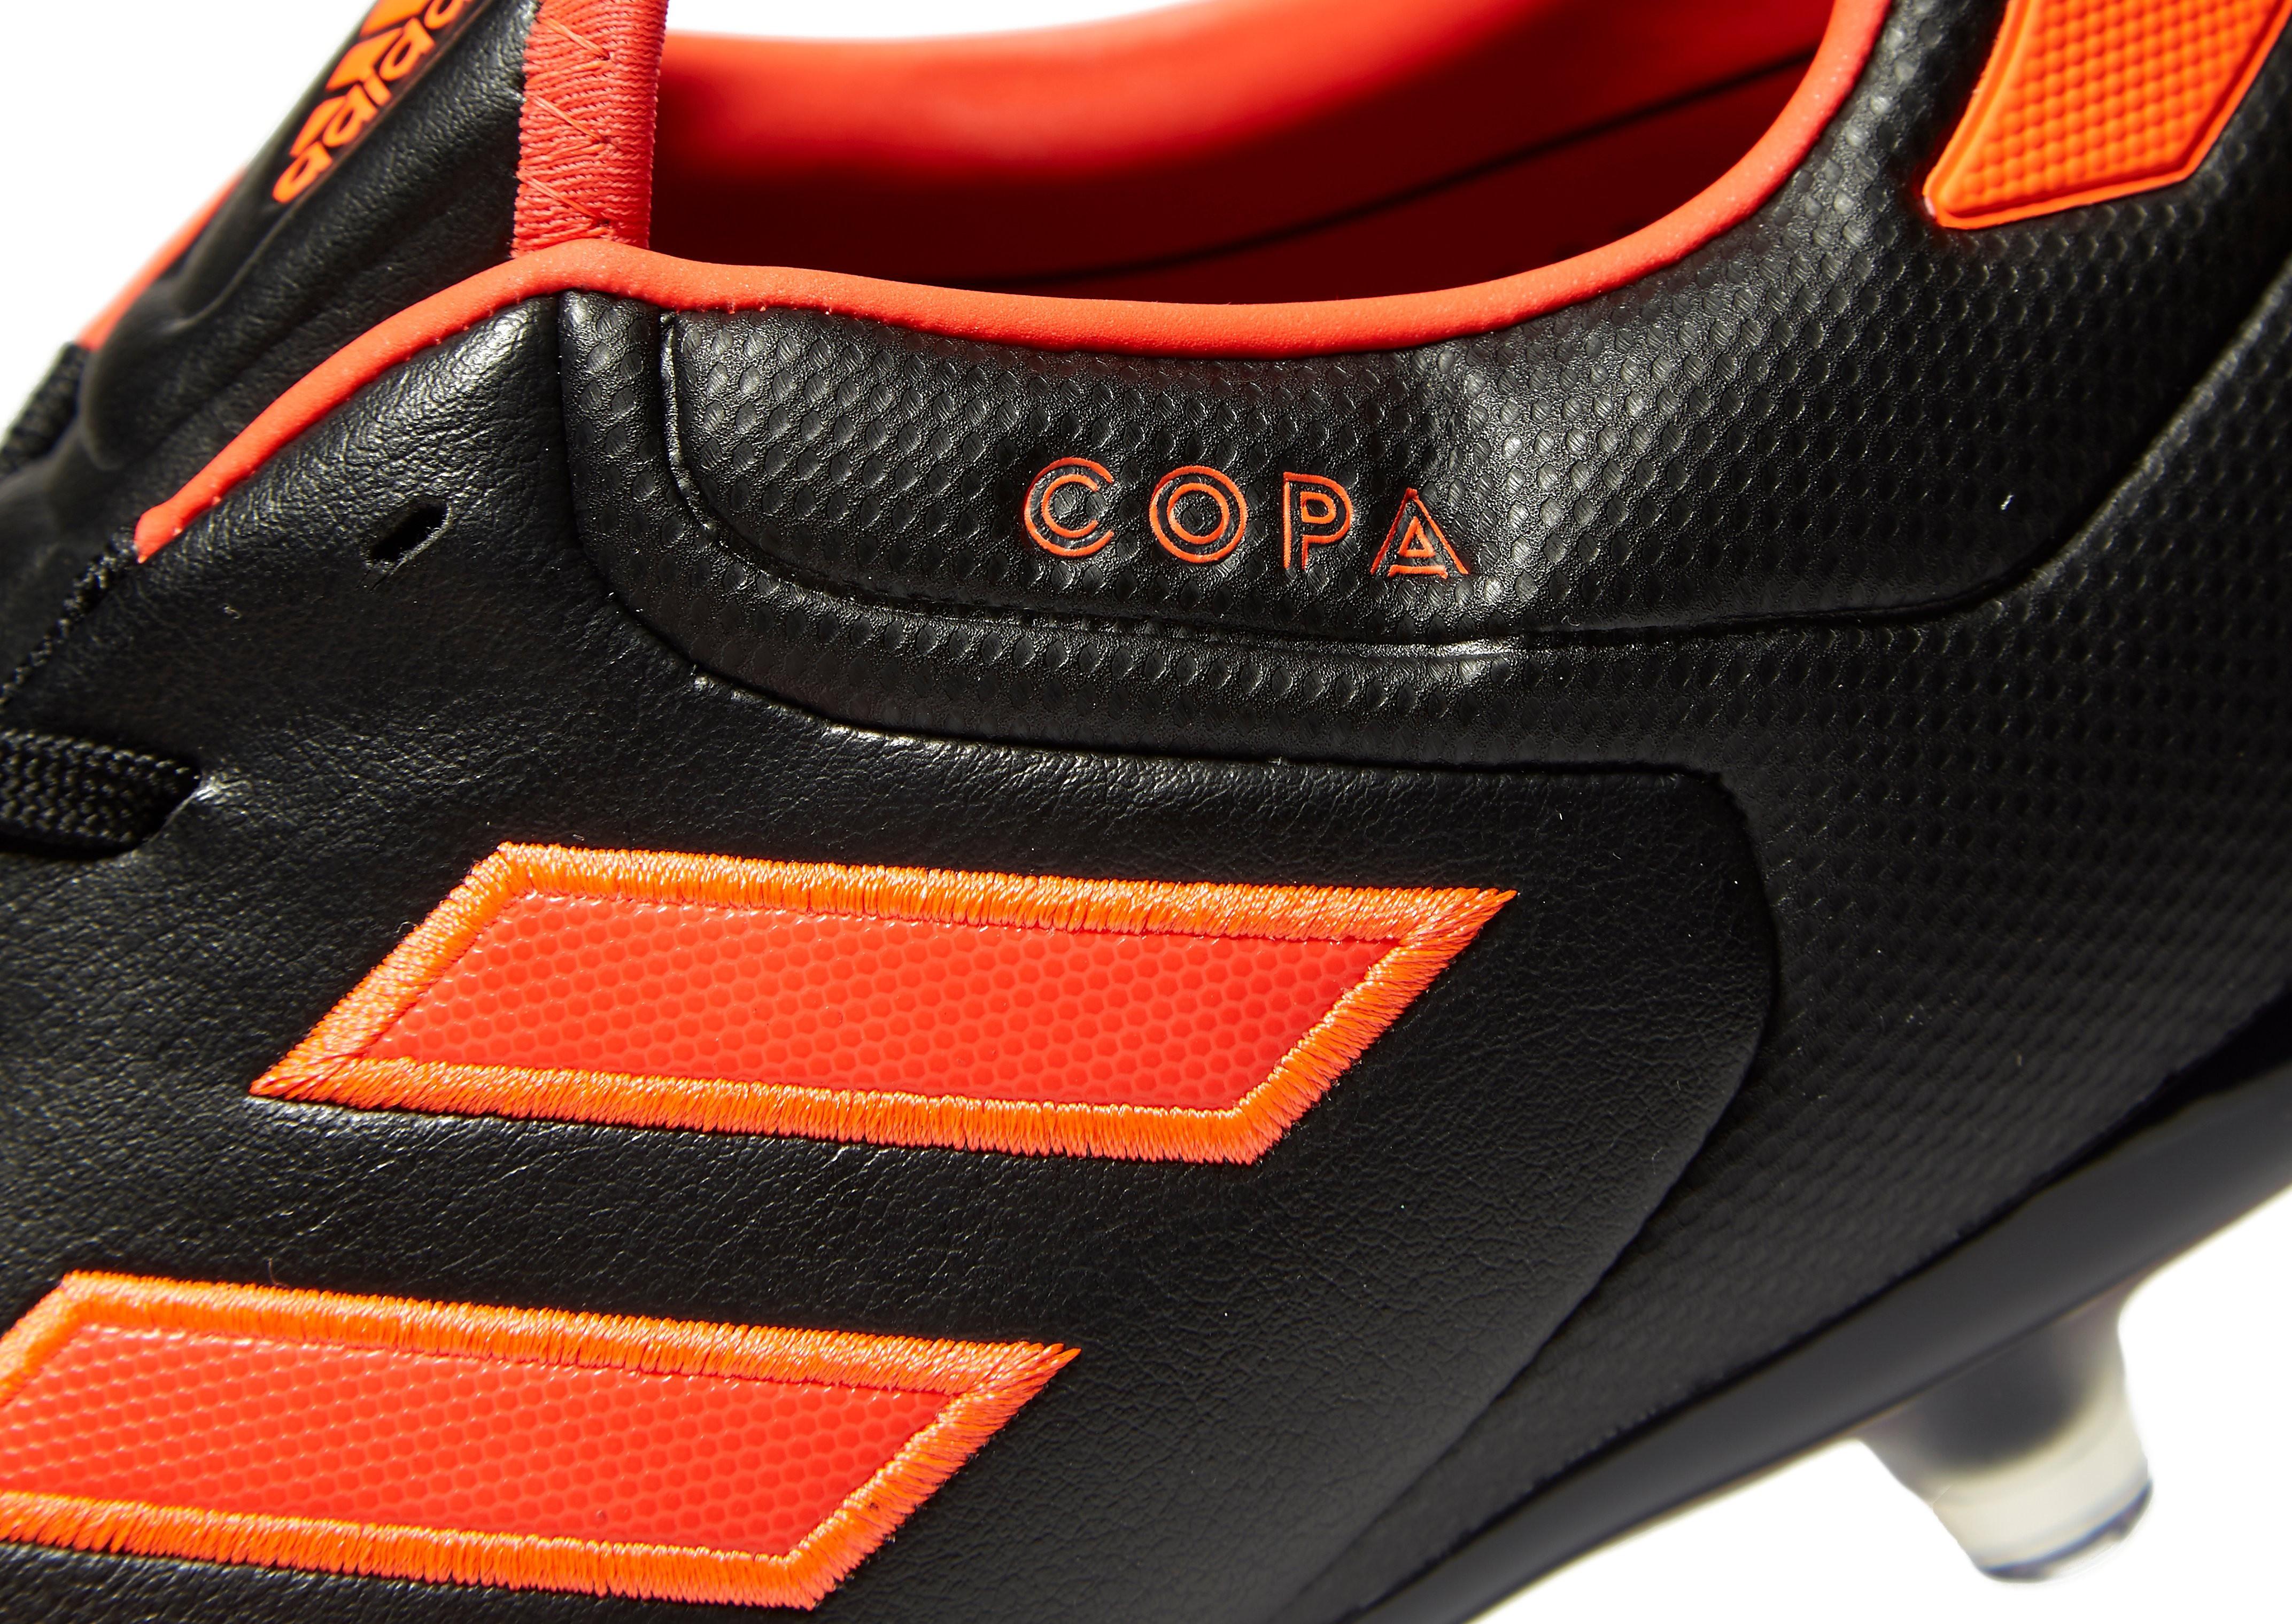 adidas Pyro Storm Copa 17.2 FG